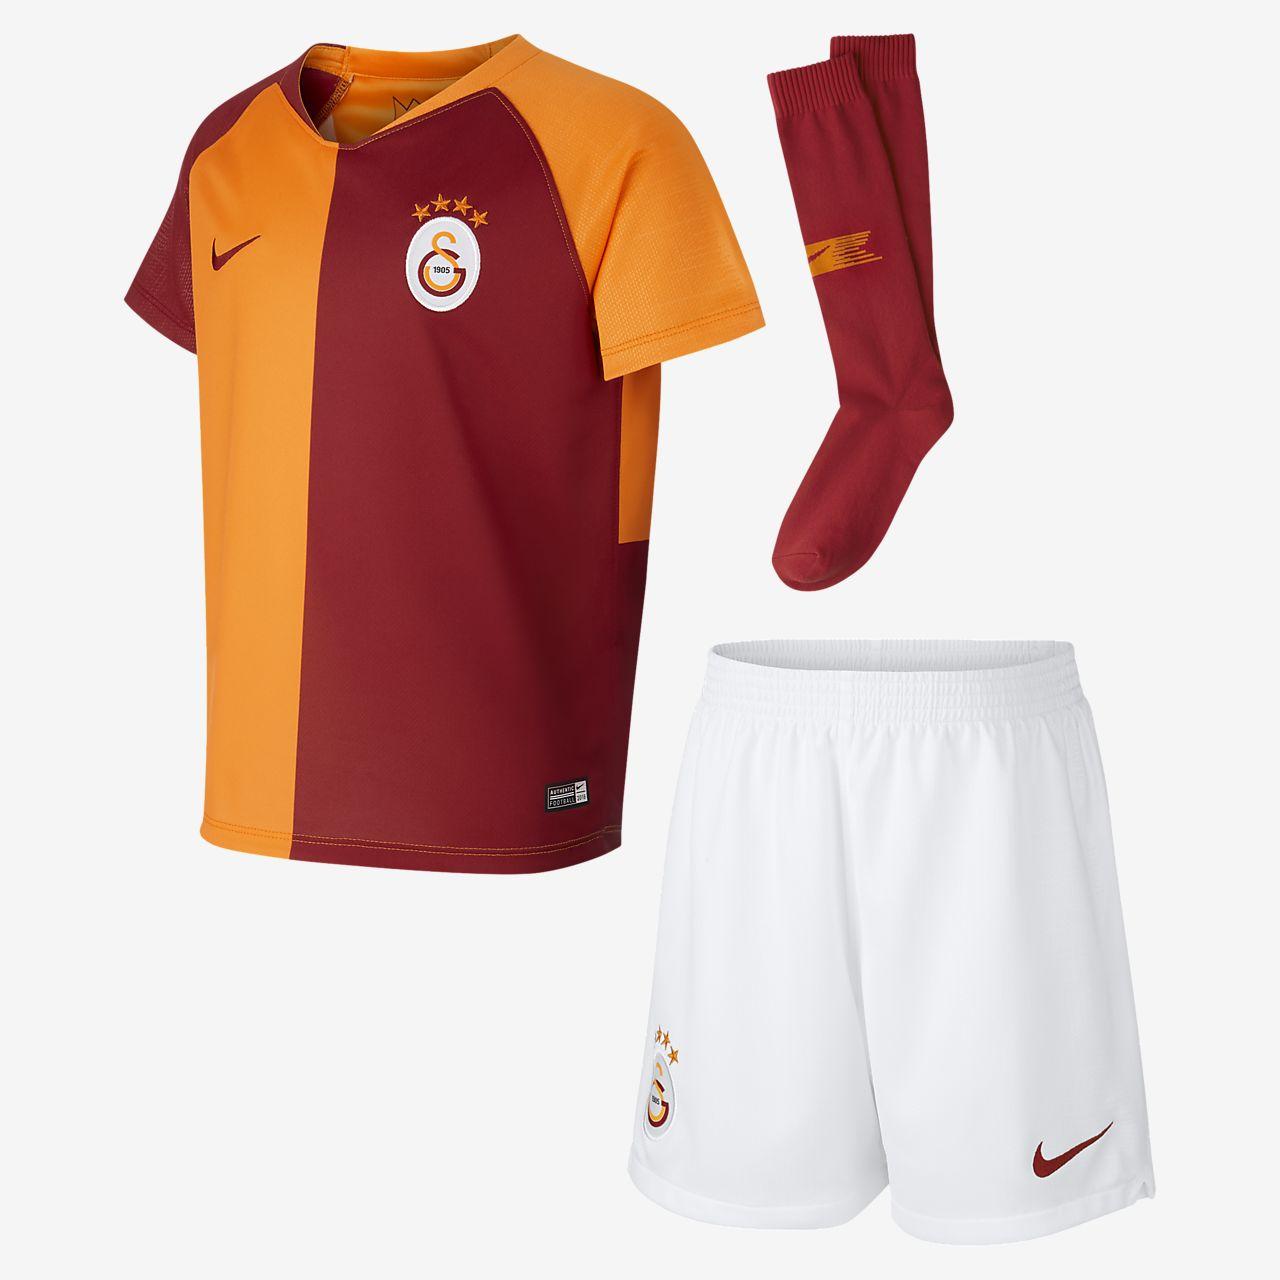 2018/19 Galatasaray S.K. Stadium Home-fodboldsæt til små børn